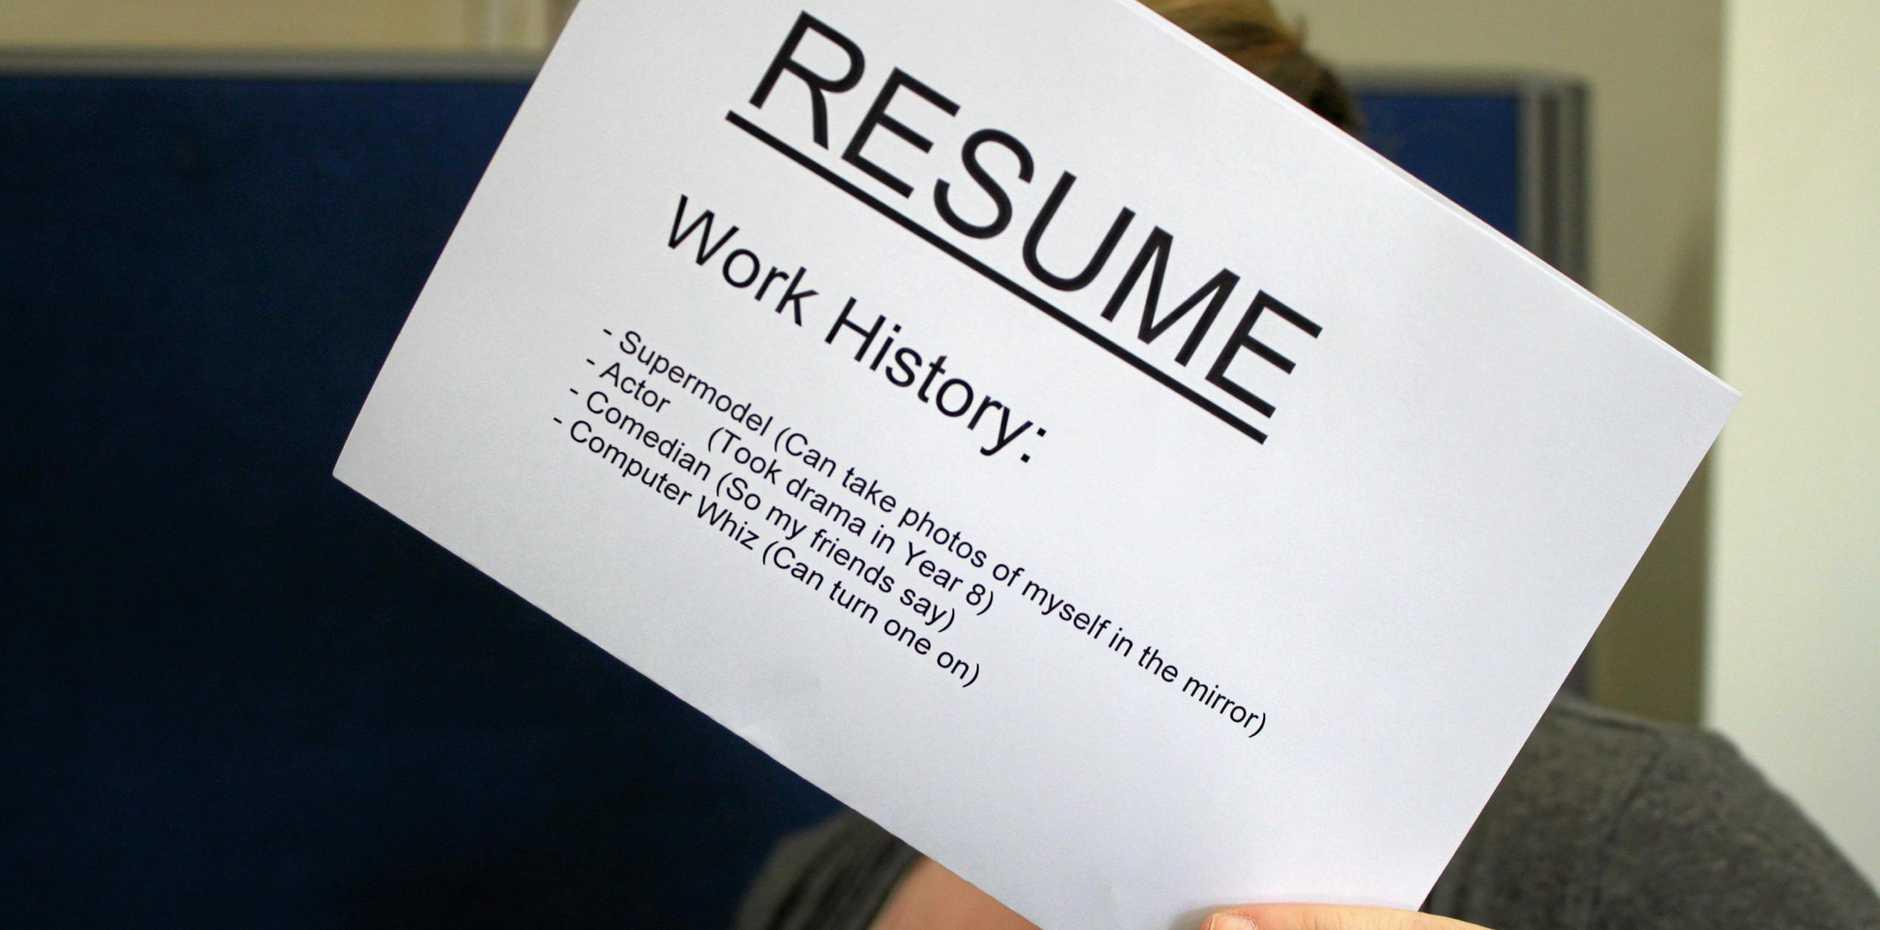 JOBSJOBSJOBS: 21 jobs going in Warwick right now.